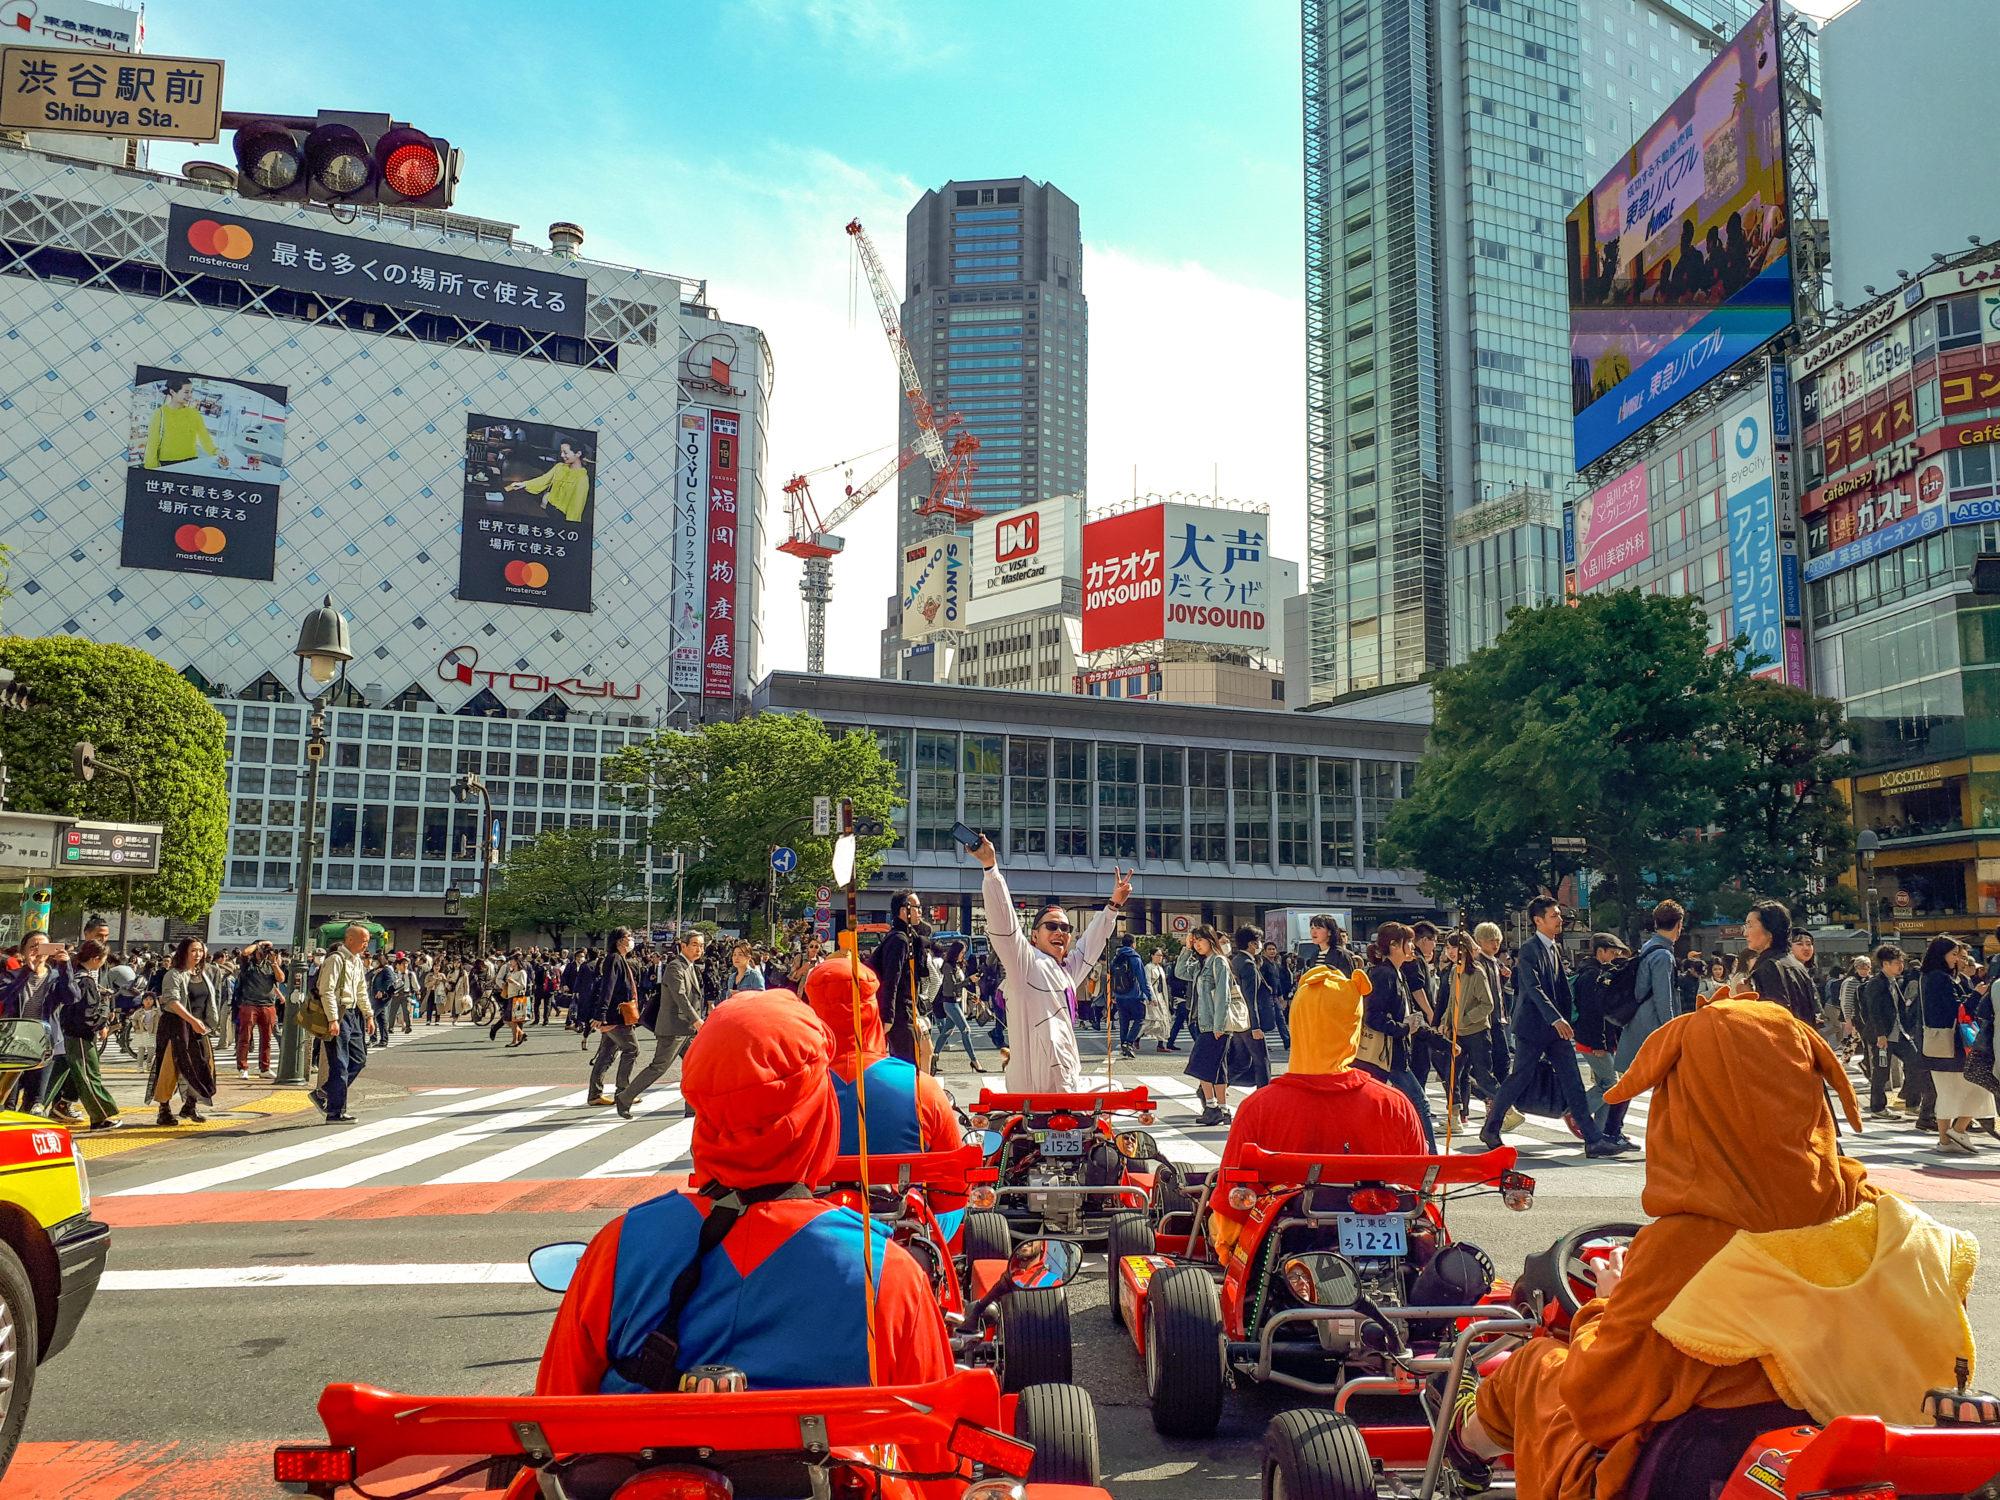 Real Life Mario Kart, Shibuya